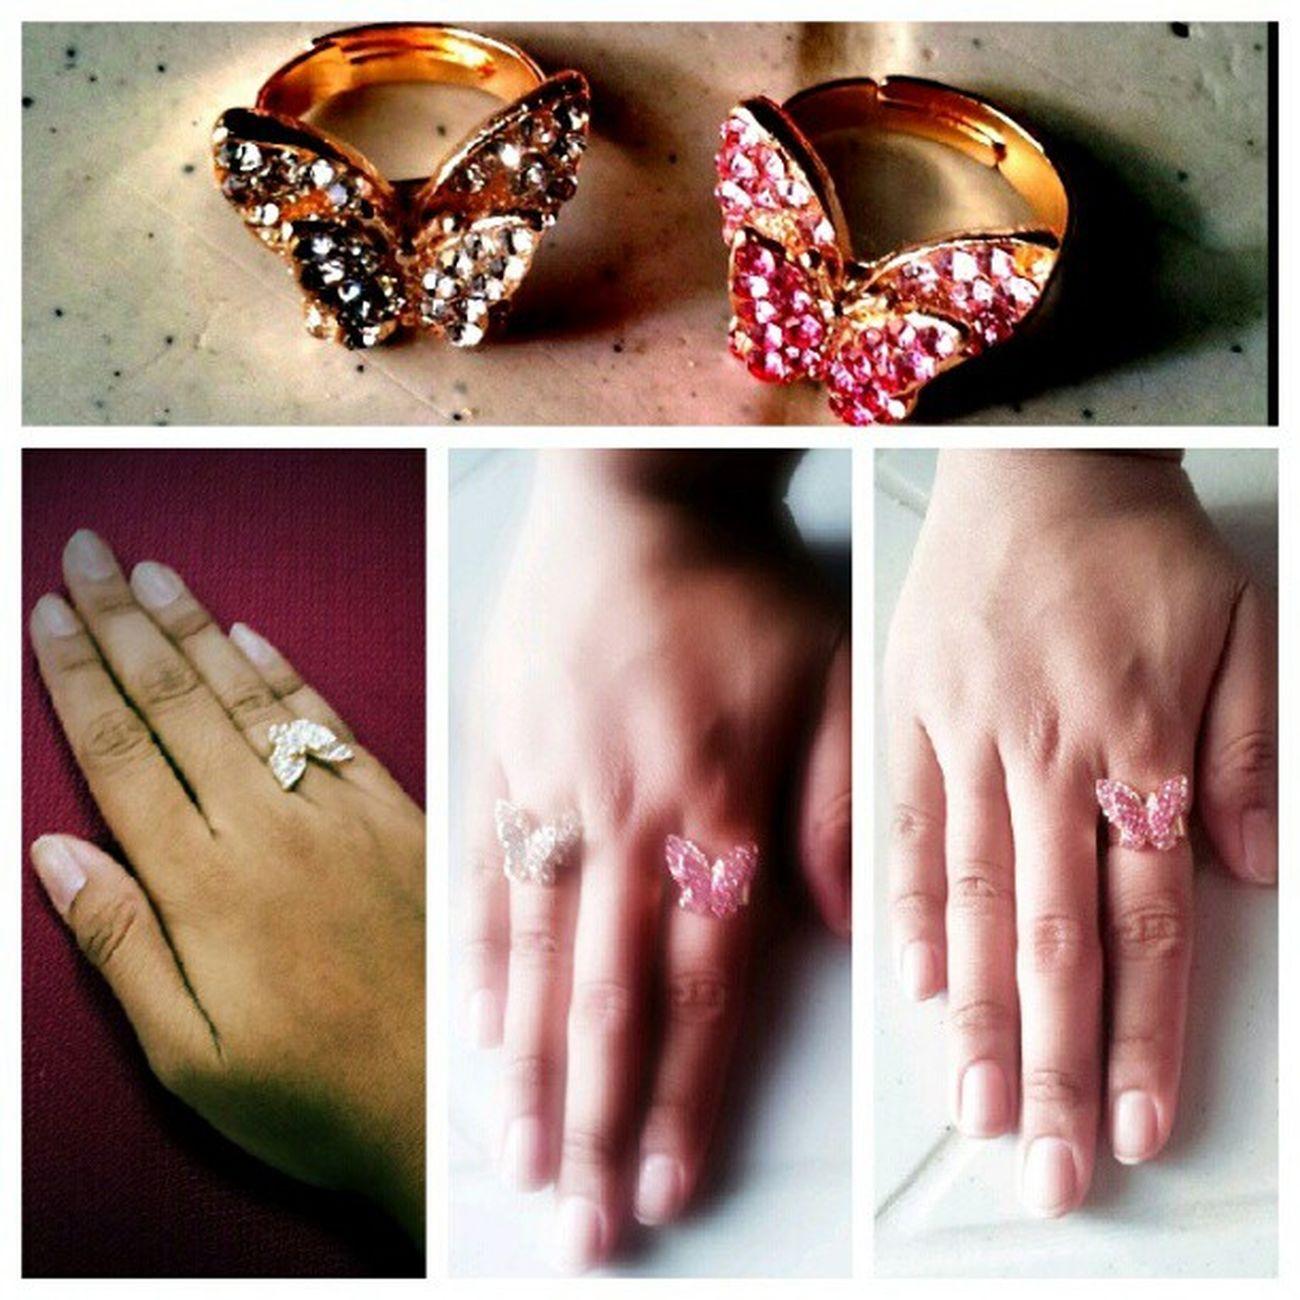 ♥ ☆ ♥ Fingerbling Glittery Shimmering Shiny butterfly mariposa rings blingbling